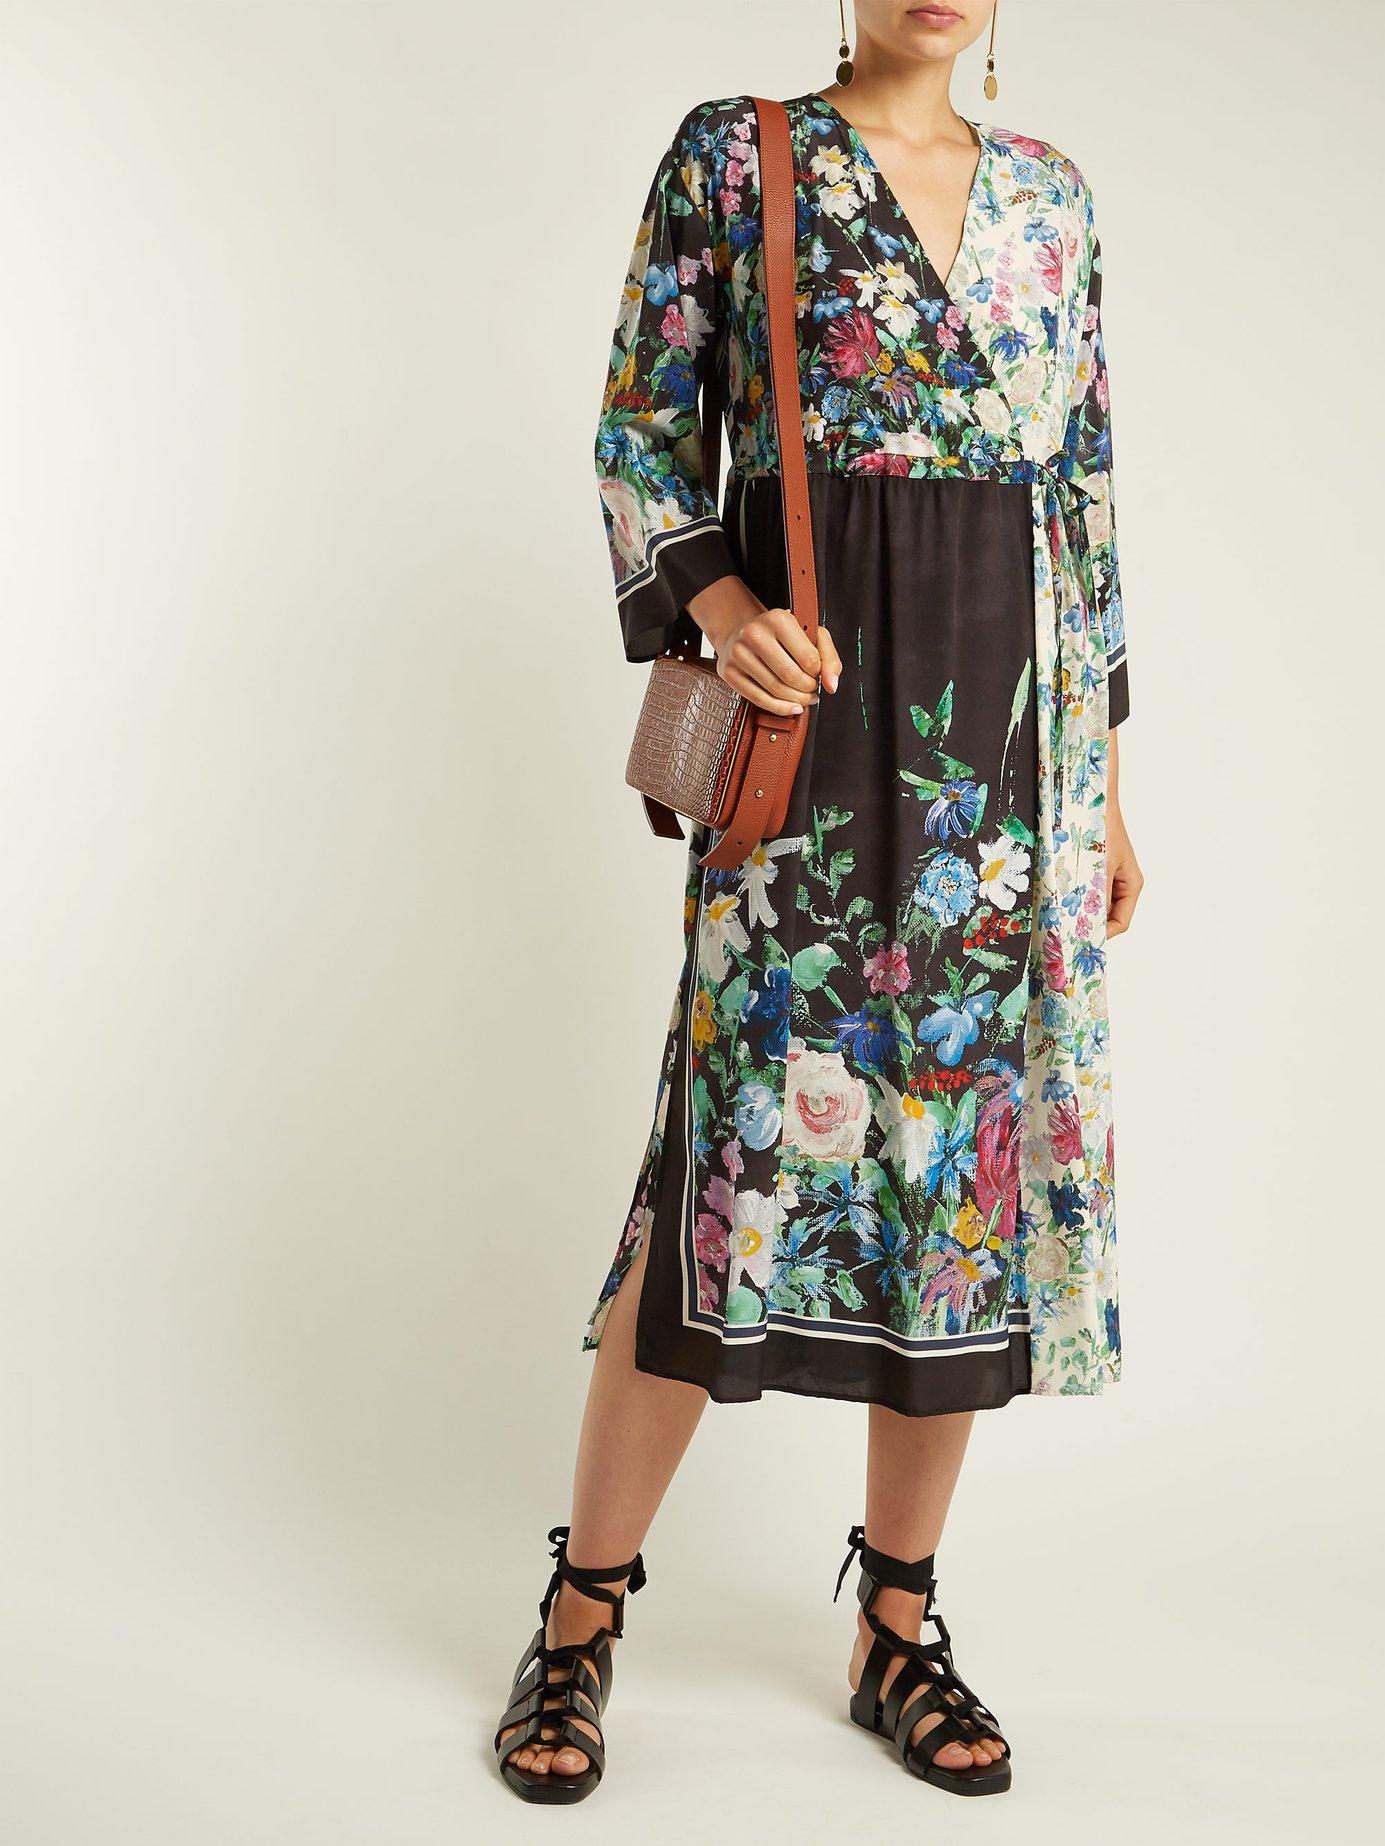 Smalto floral-print silk dress by Weekend Max Mara